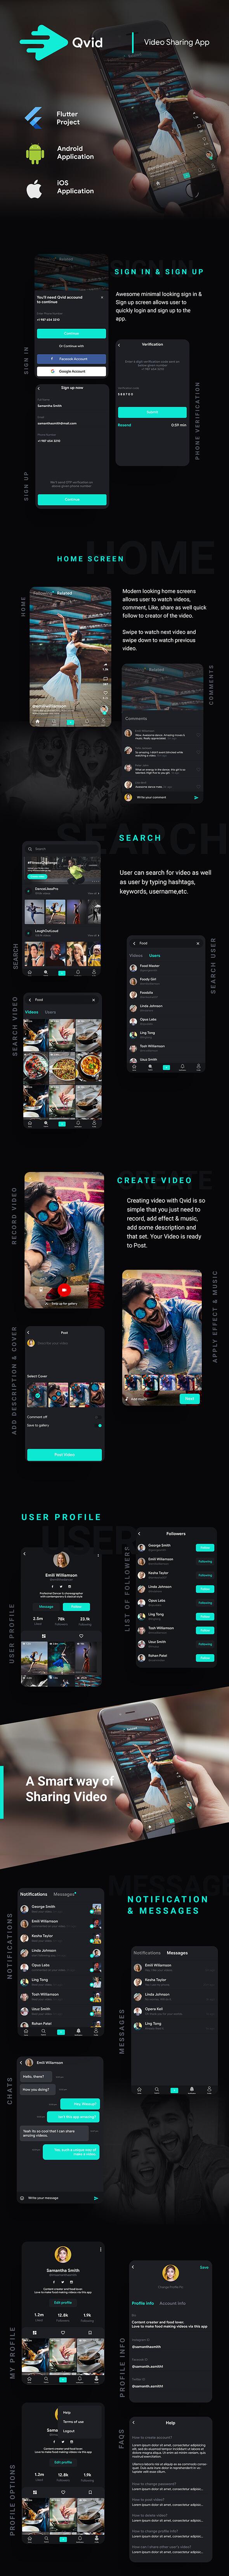 TikTok App| Video Creating Android App+ Short Video iOS App| Flutter Template| Qvid - 2